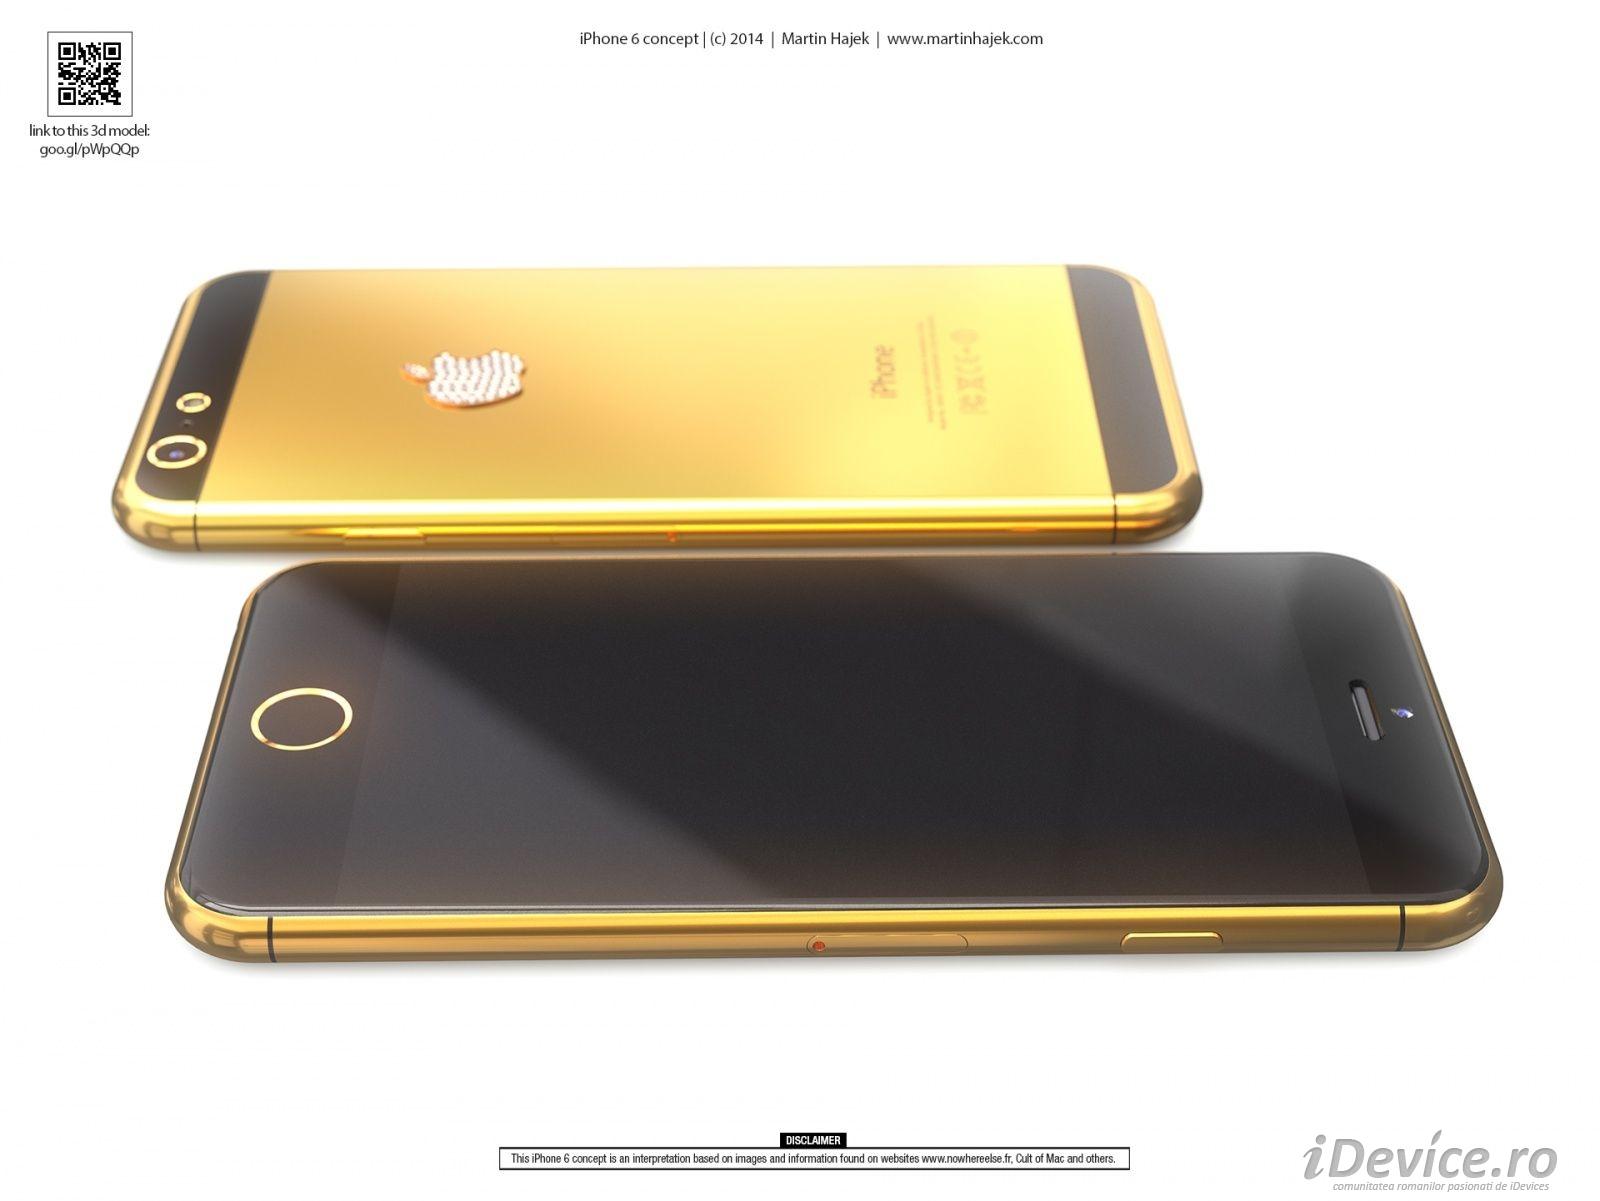 iPhone 6 auriu - iDevice.ro 2